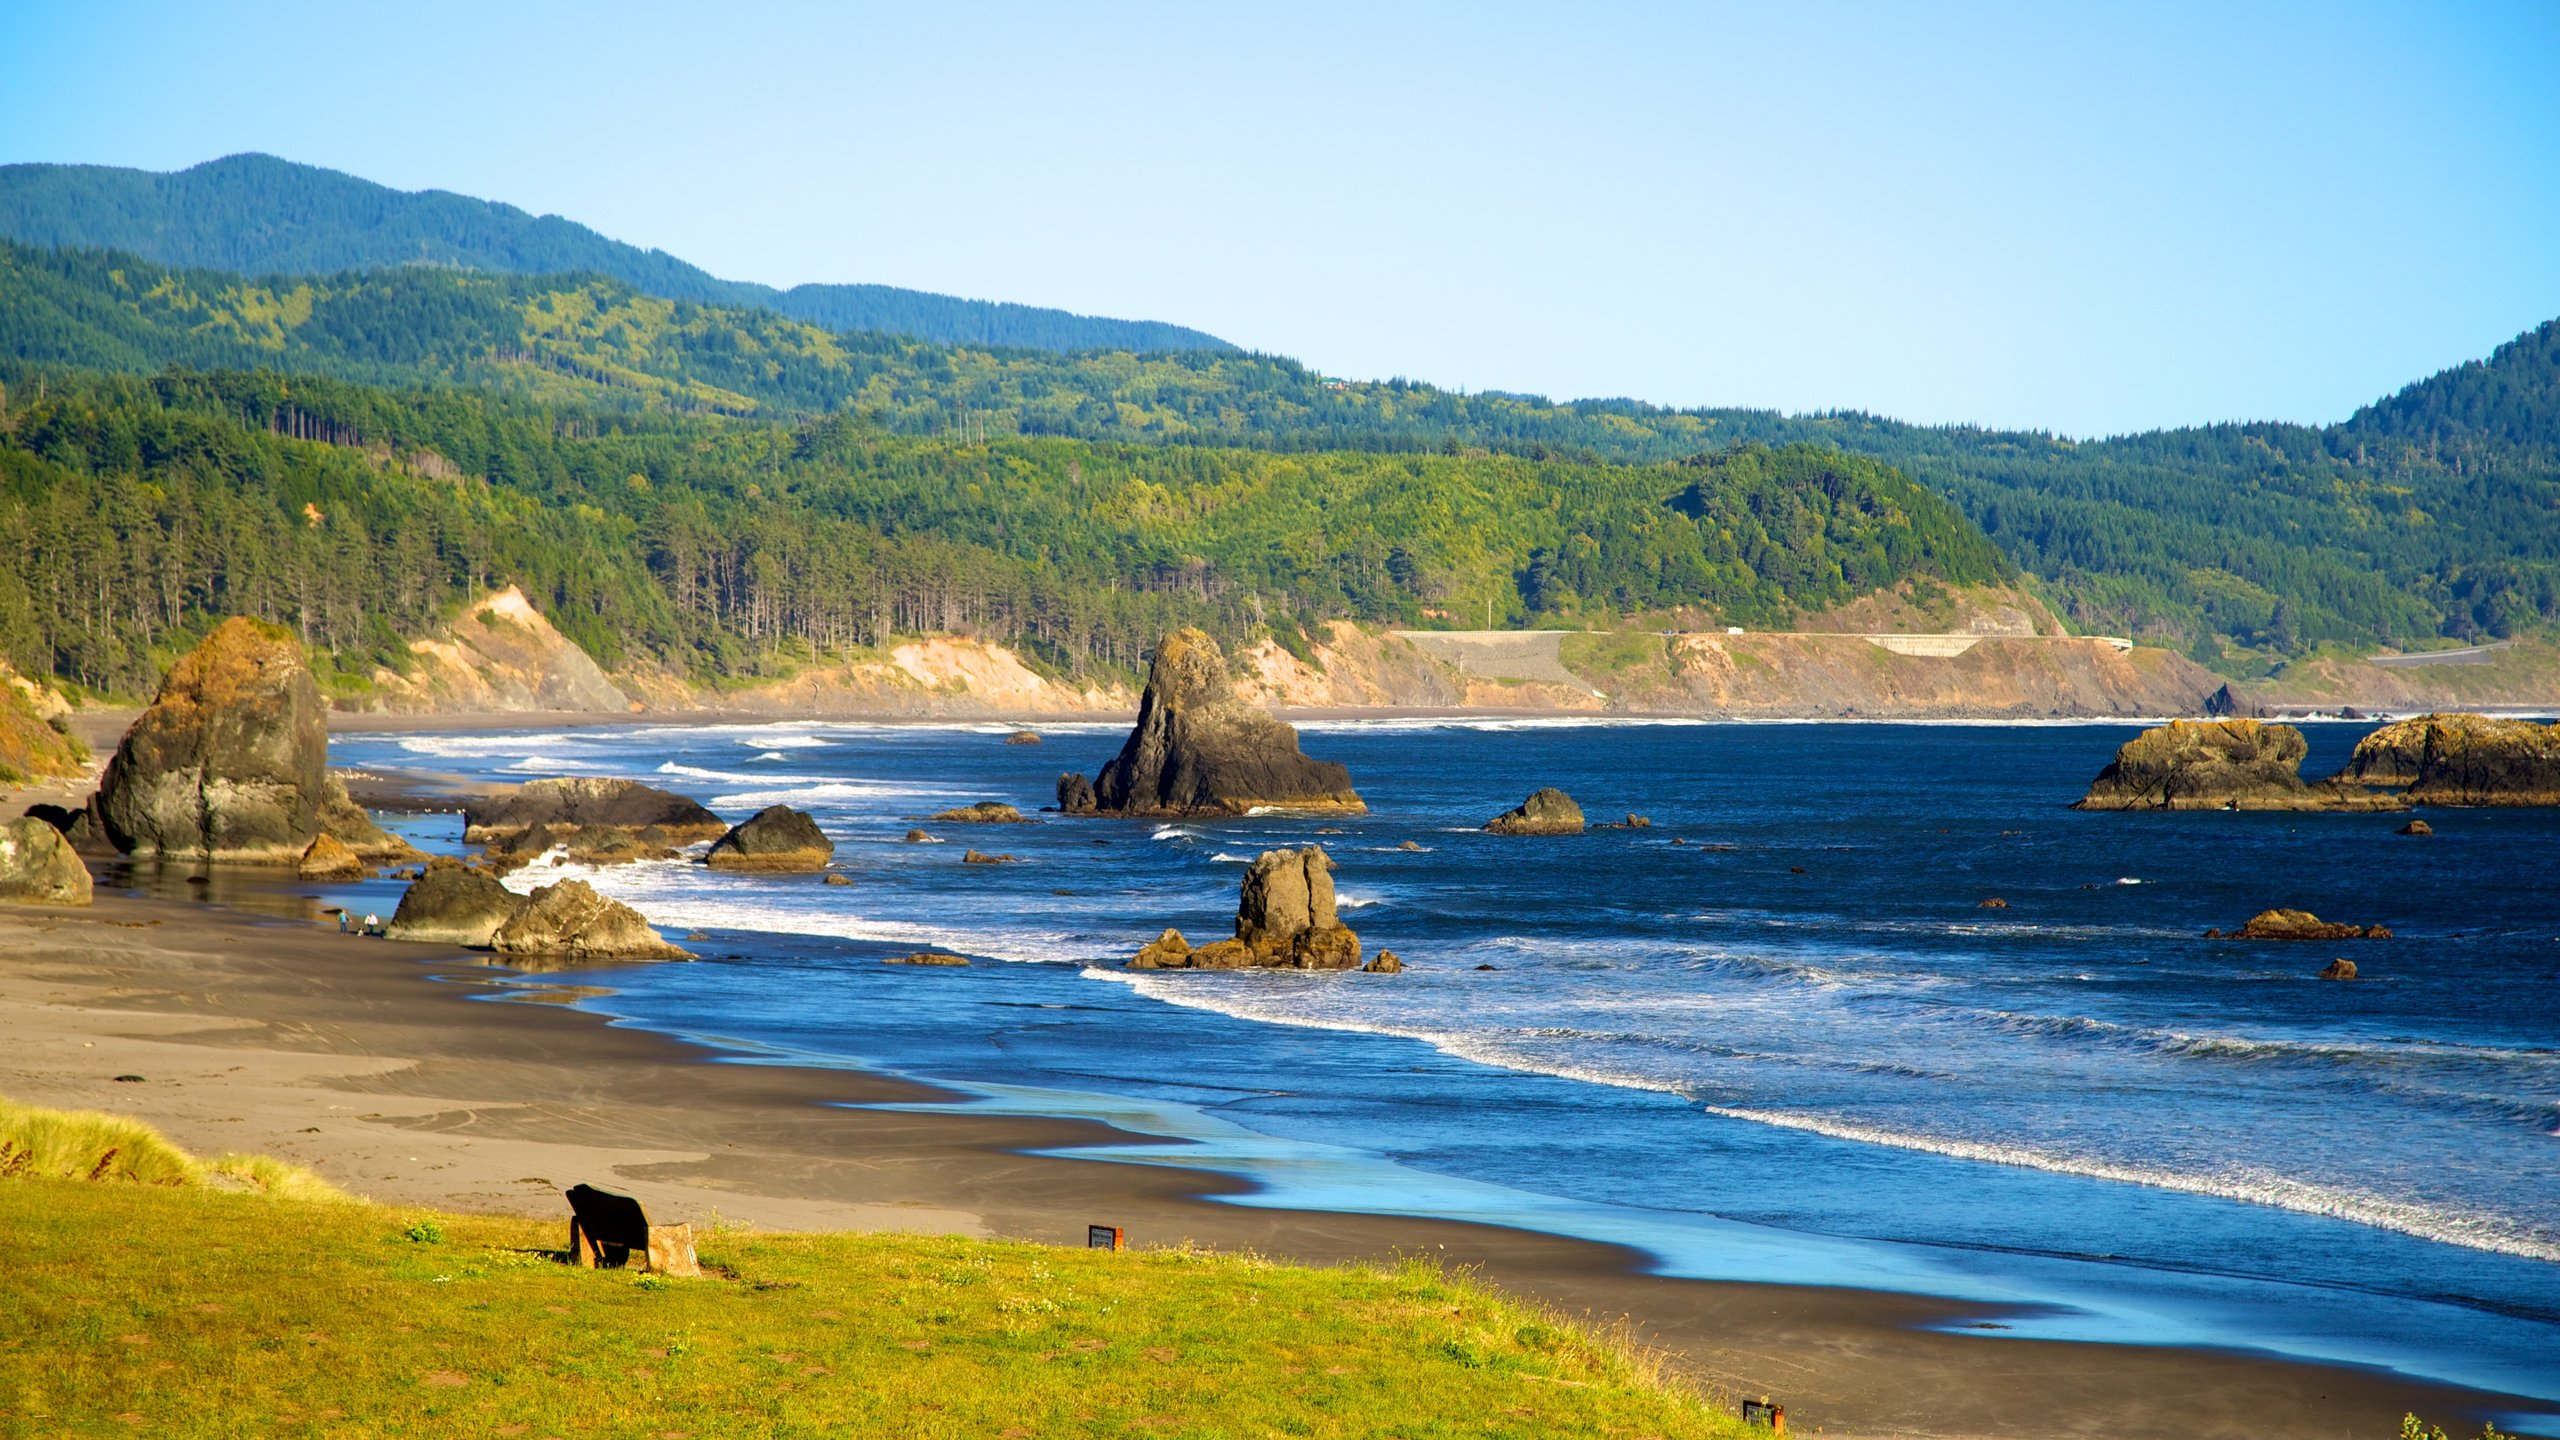 Port Orford, Oregon, United States of America